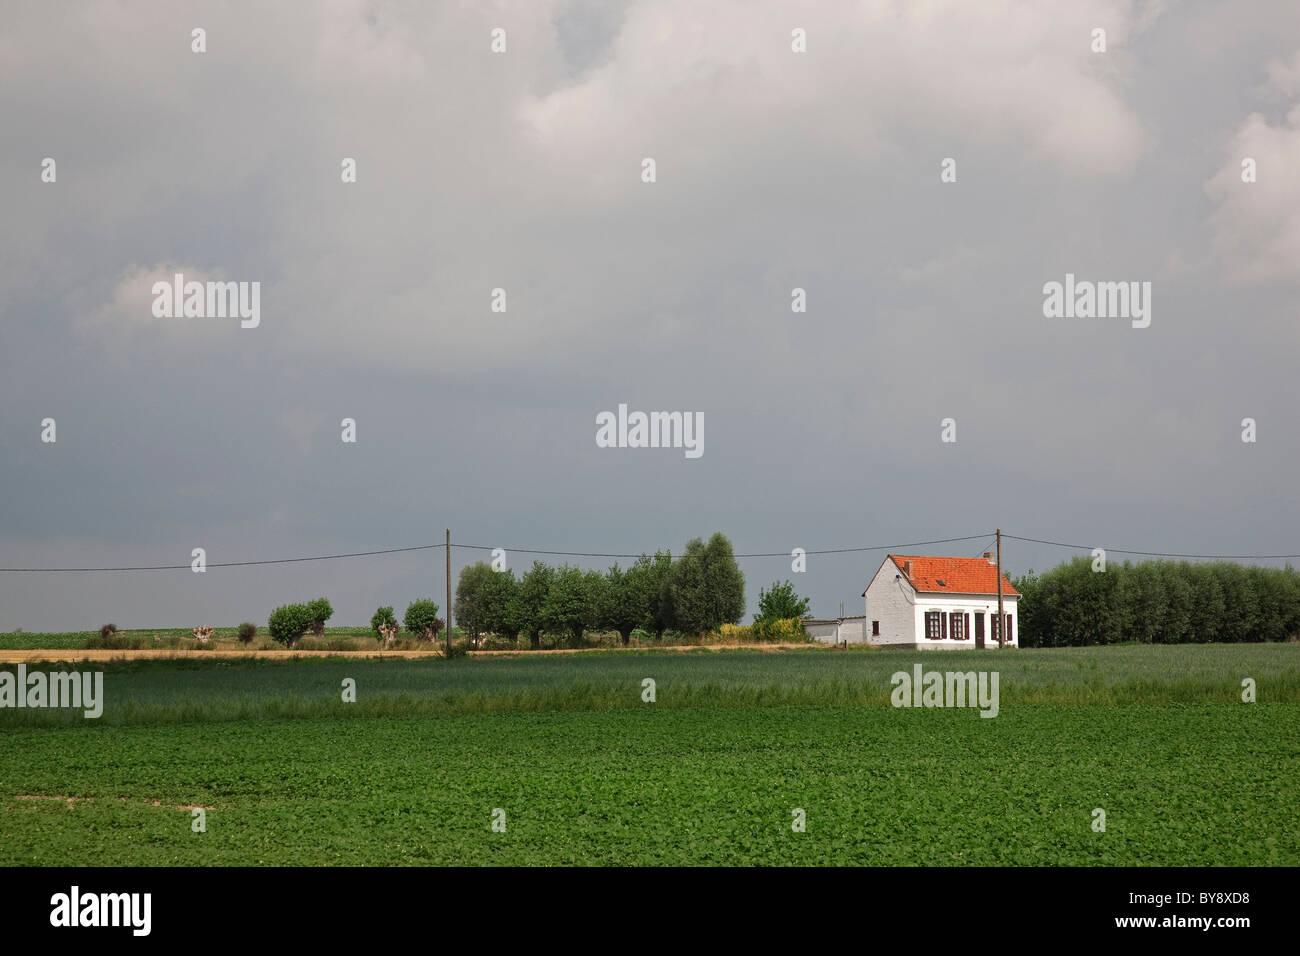 Working-class / labourer's cottage in the Leie region at Sint-Denijs / Kooigem, Flanders, Belgium - Stock Image